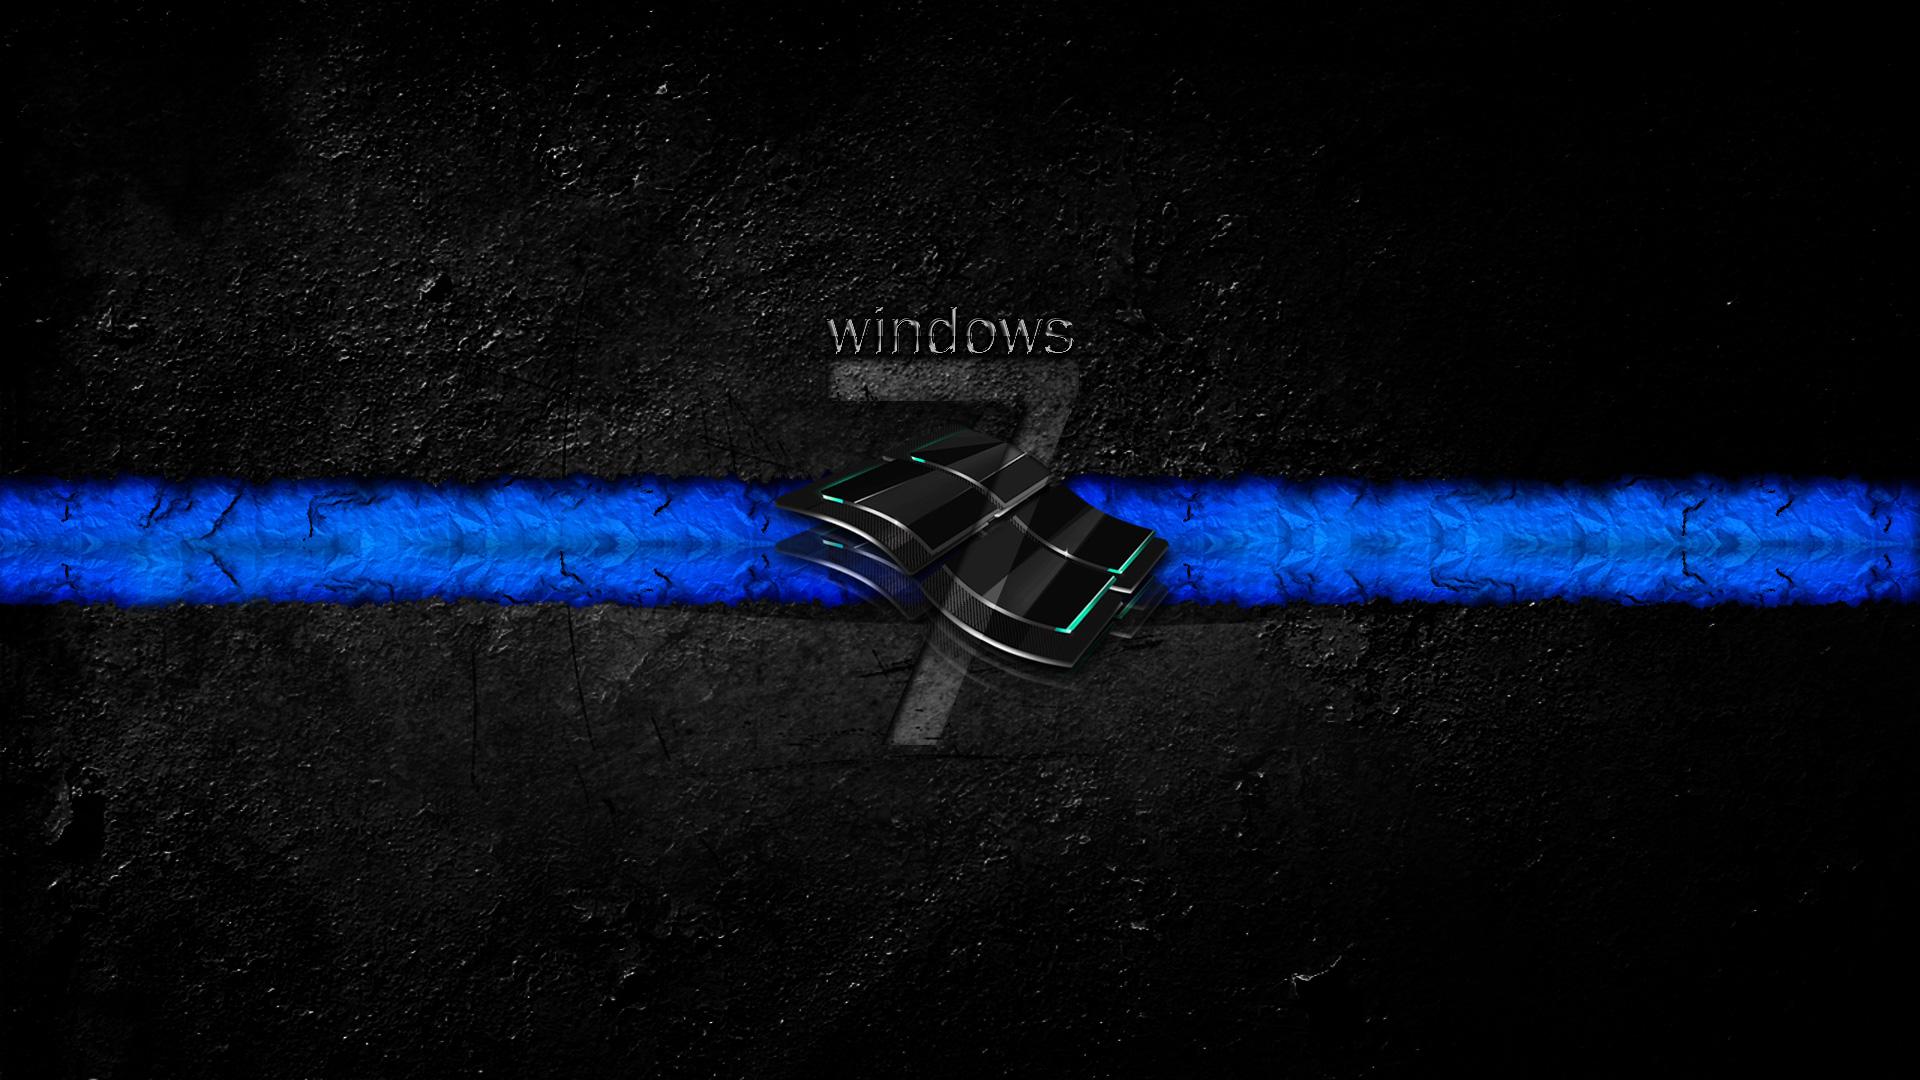 Windows 7 Dirty Dark Wallpapers | HD Wallpapers